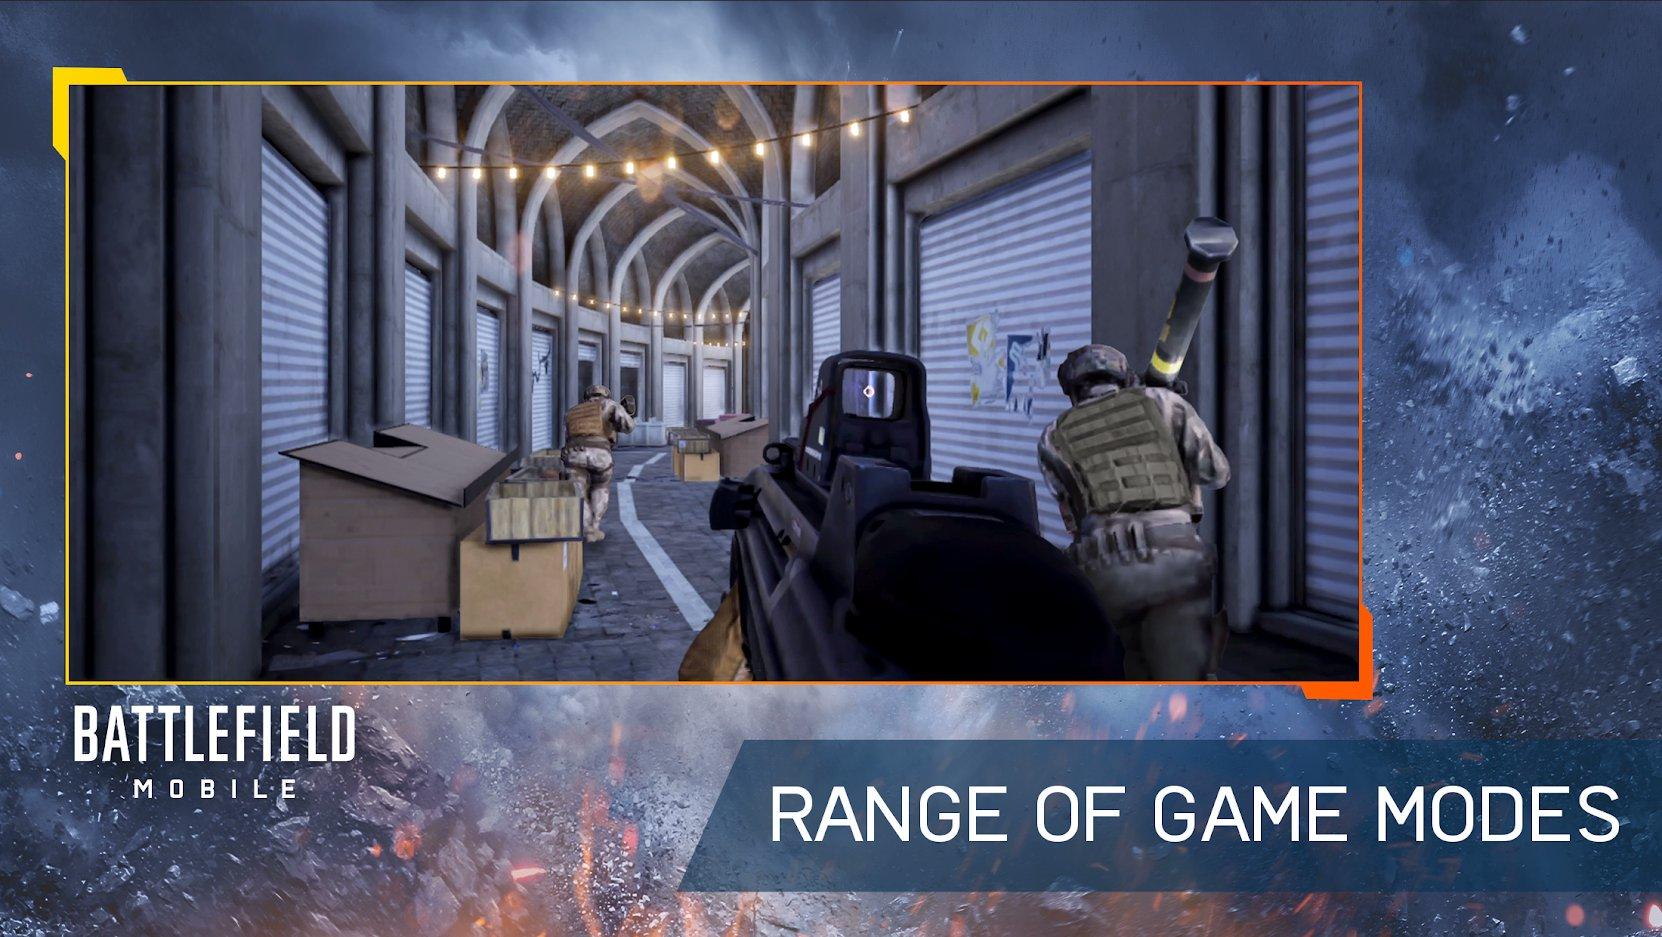 В Google Play появилась страница Battlefield Mobile